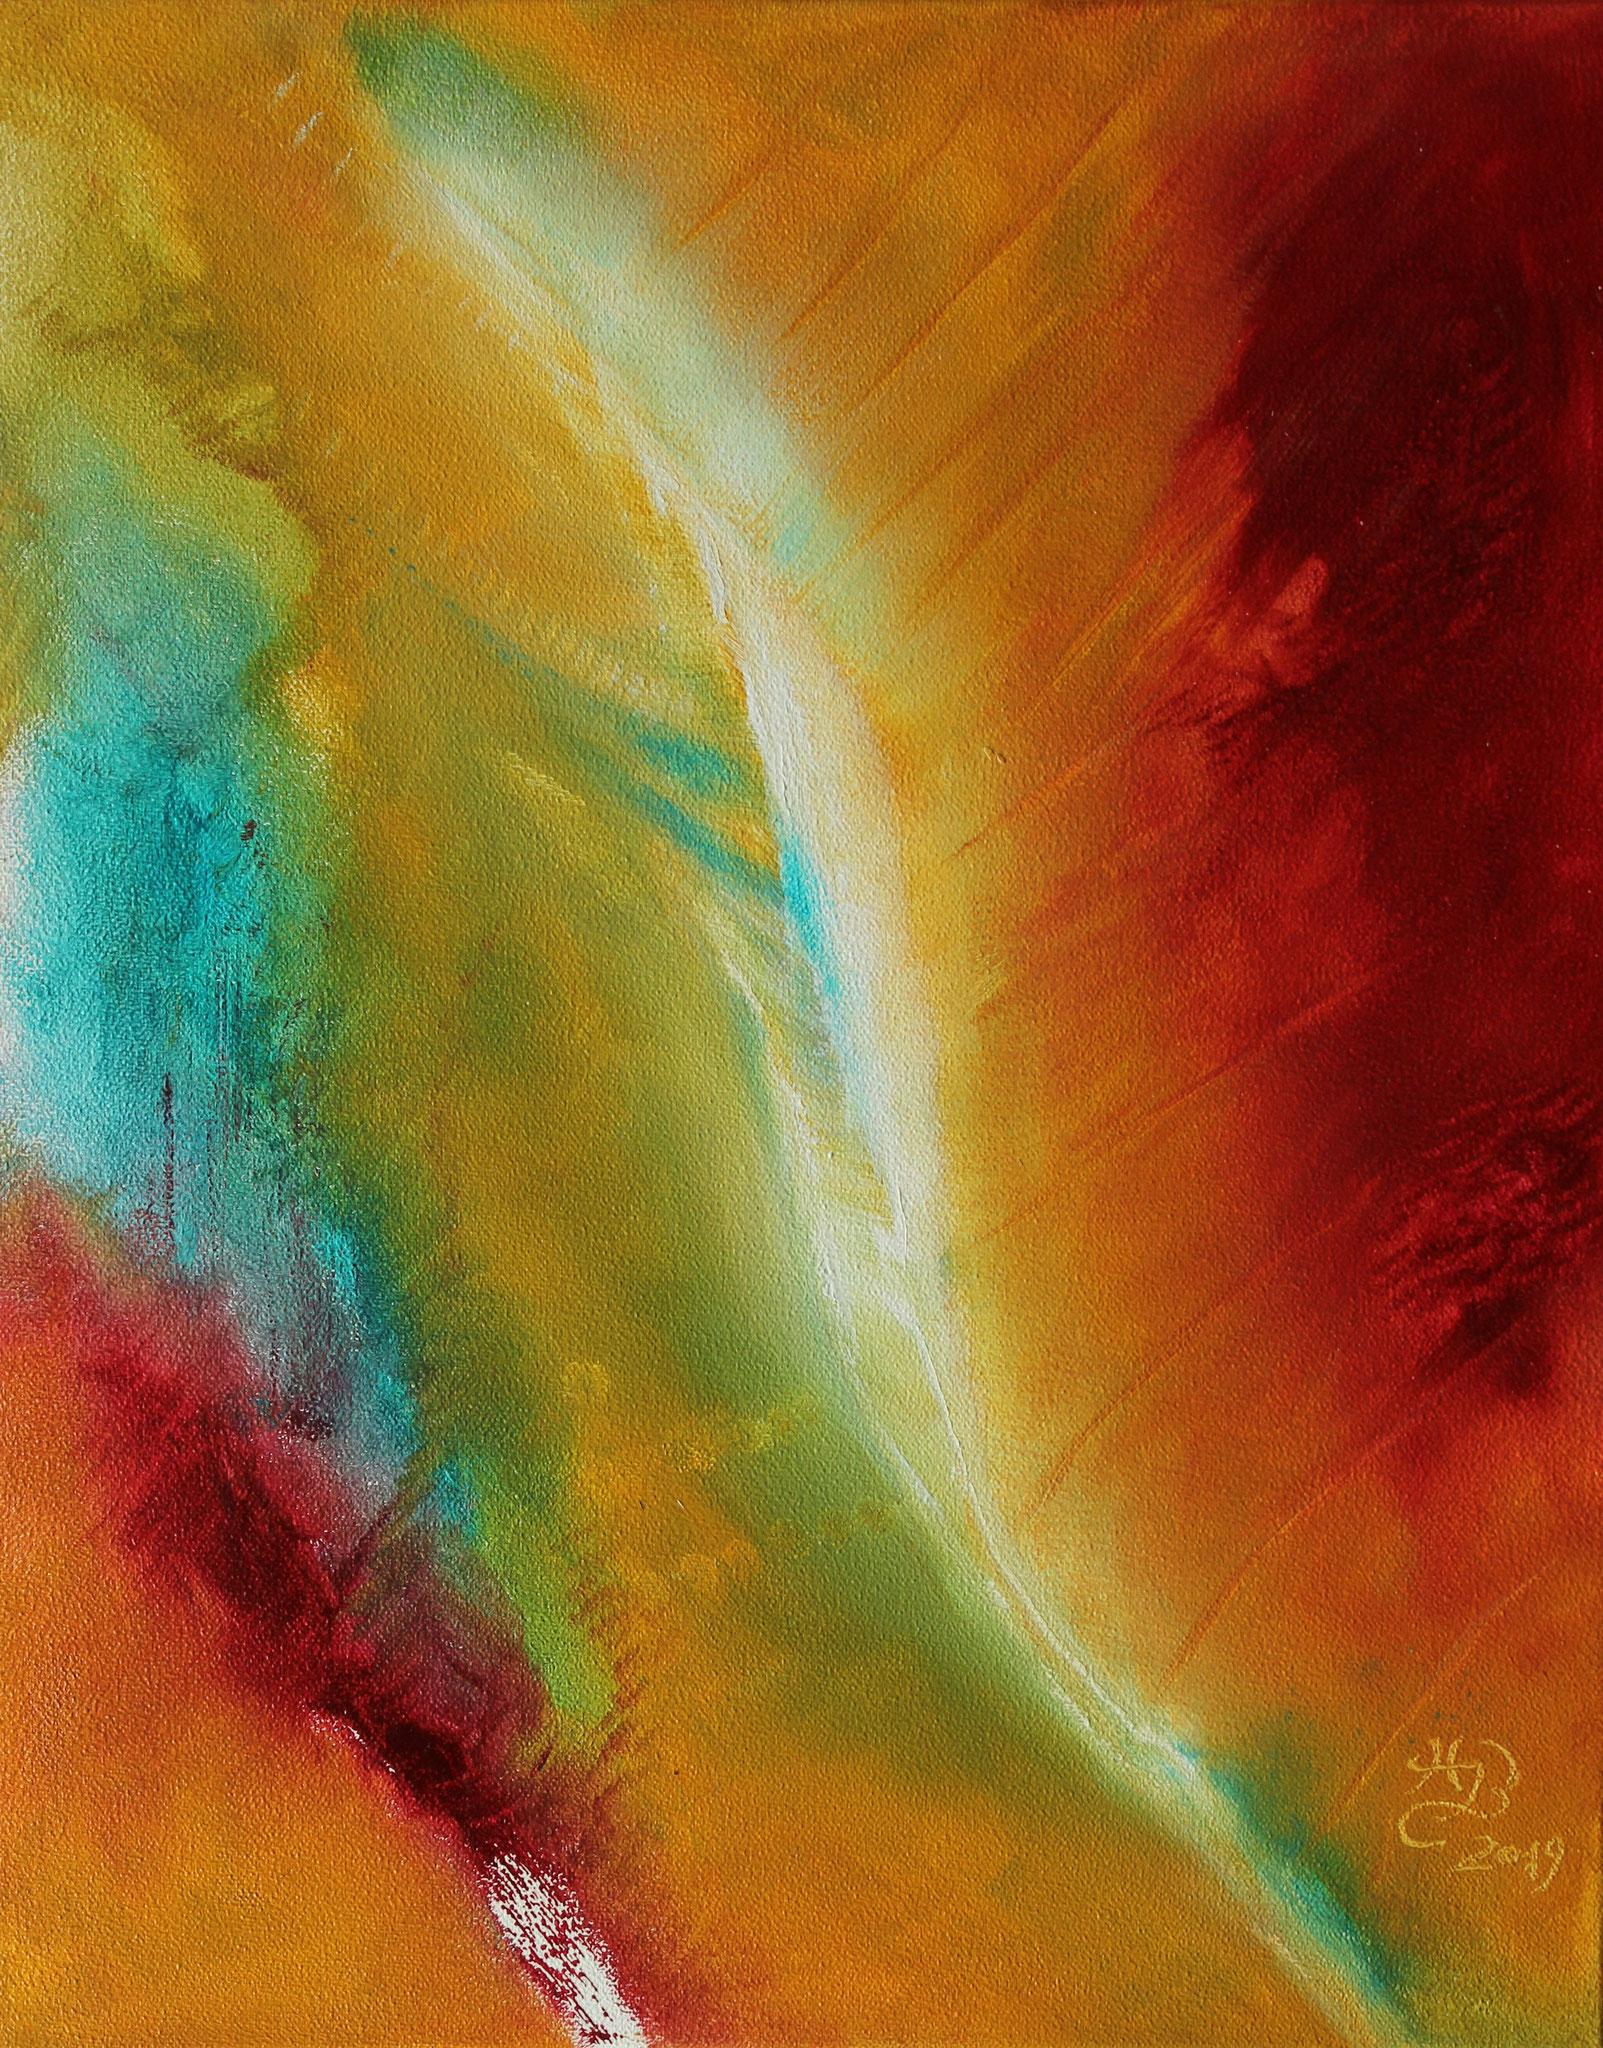 Lebensenergie, 2019, Öl, 40 x 50 cm